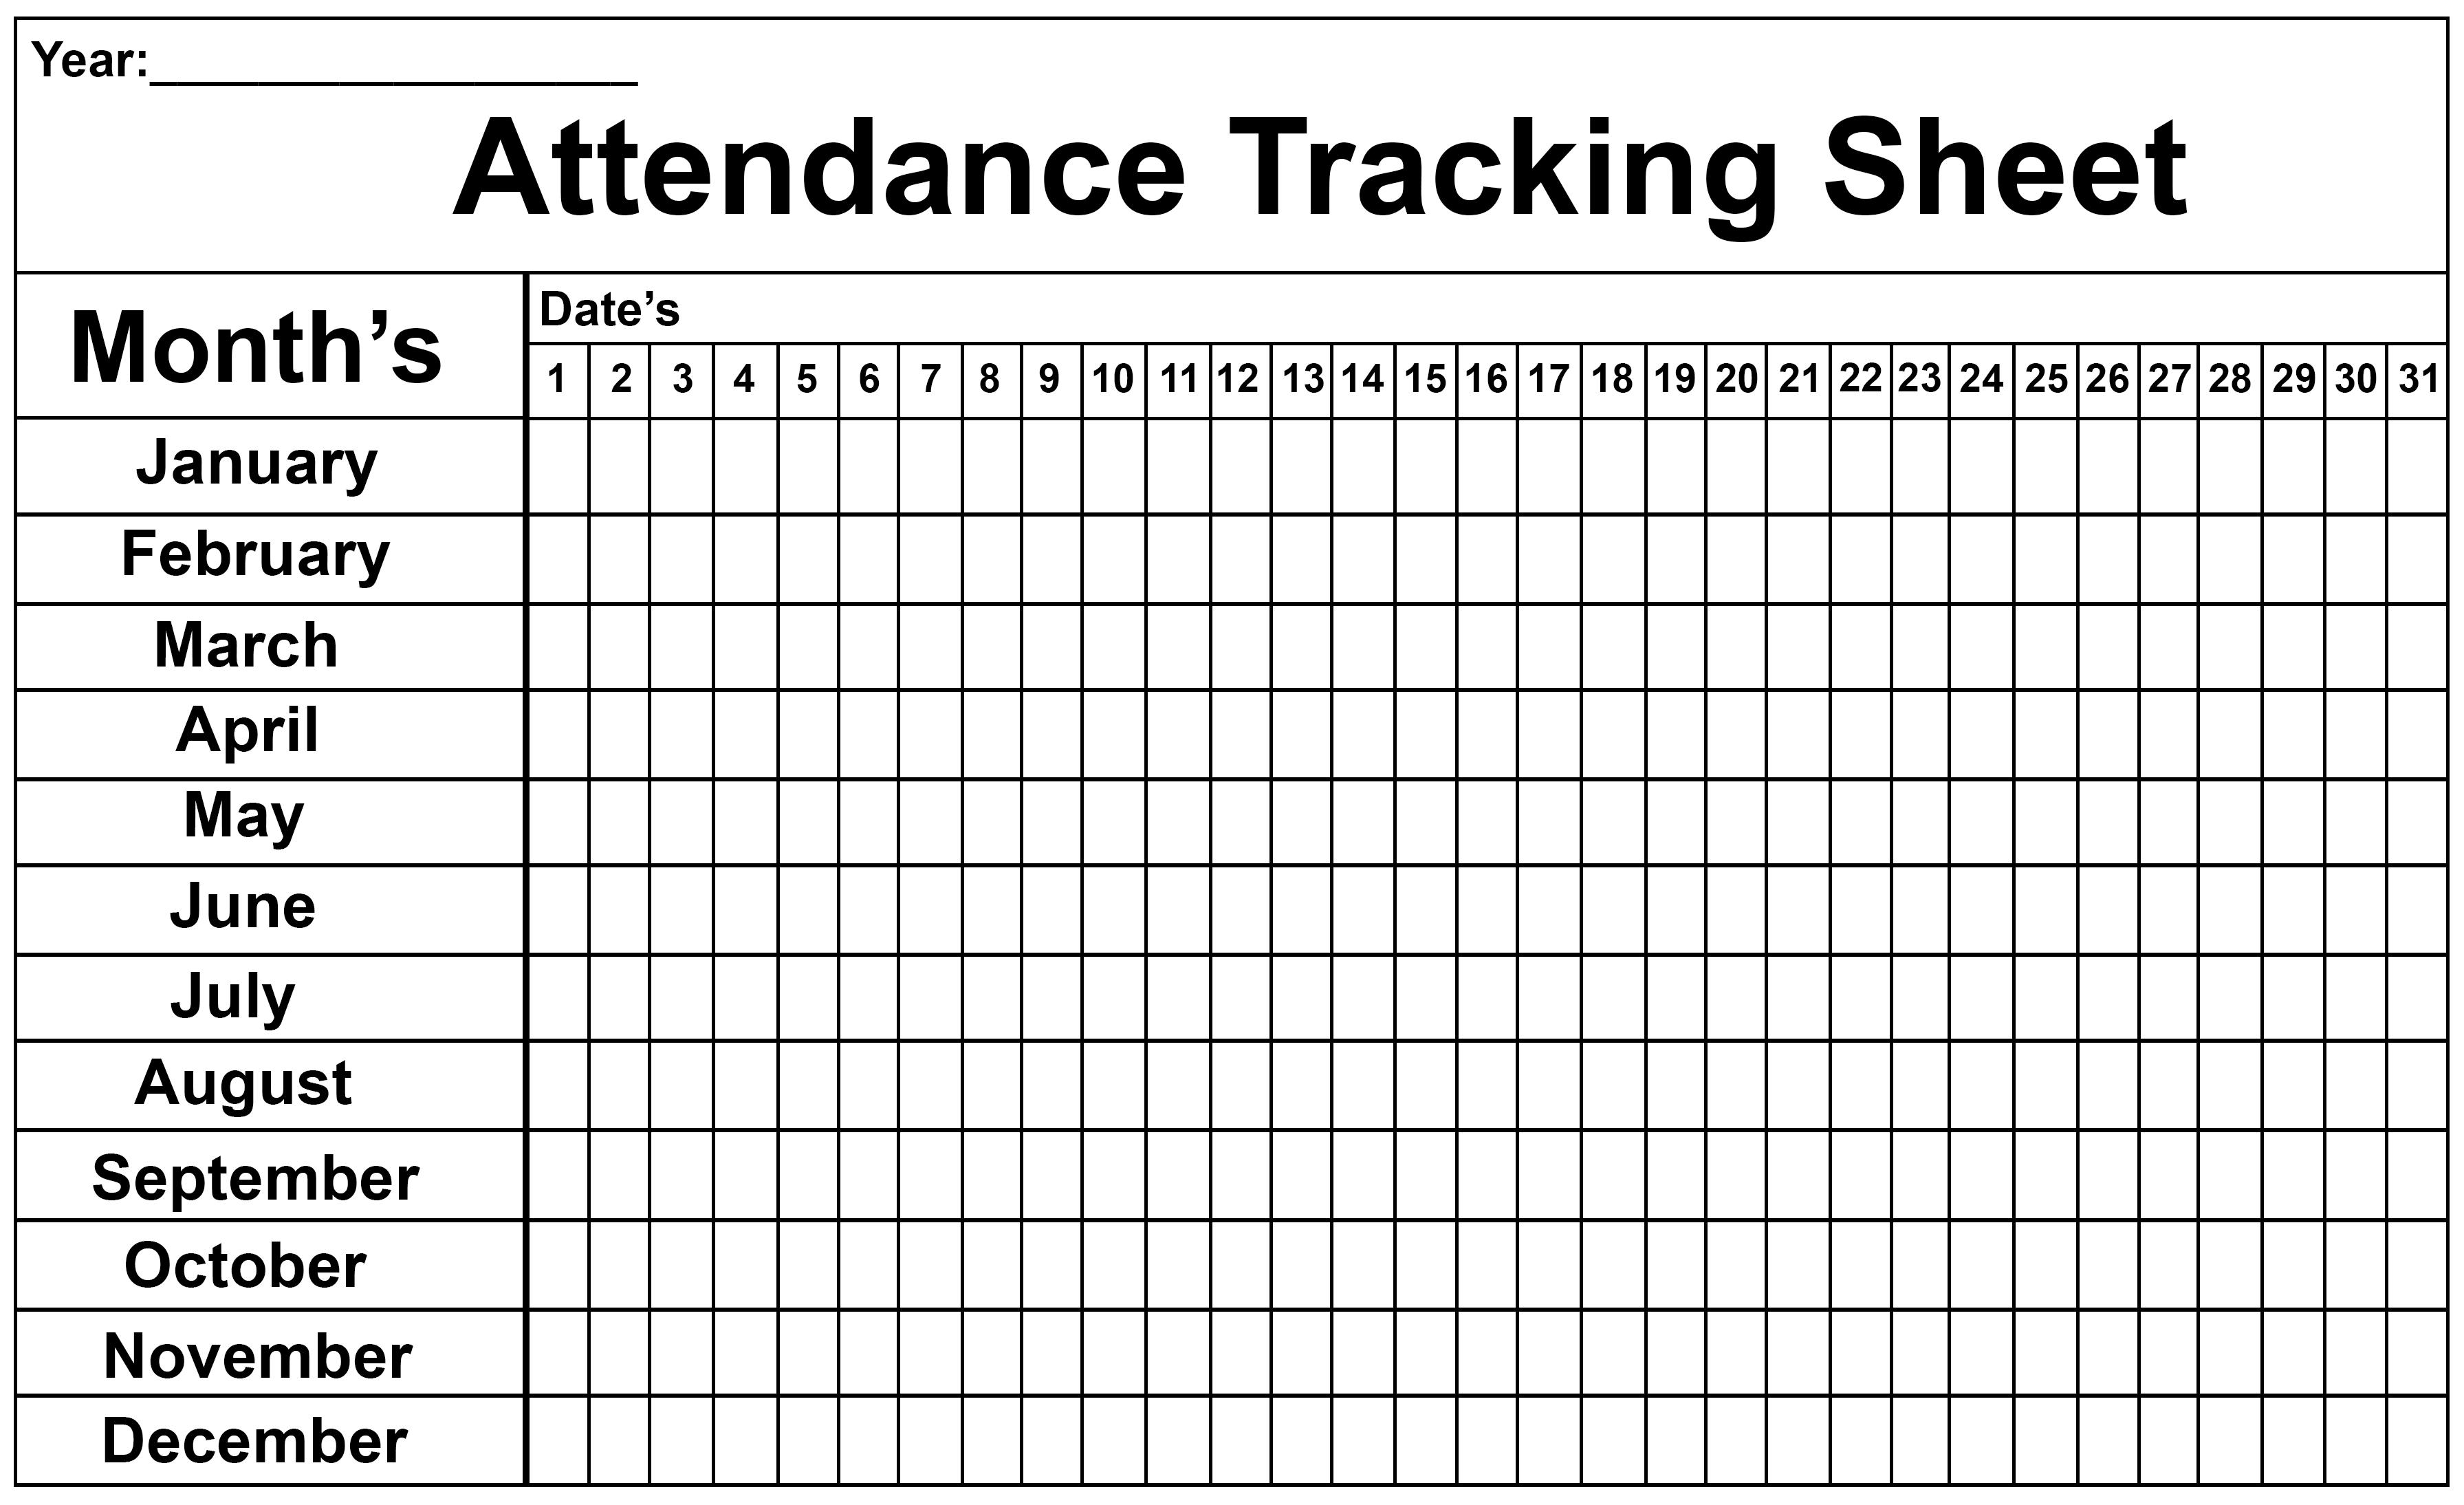 Employee Attendance Tracker Sheet 2019   Printable Calendar Diy with regard to Printable July Employee Template